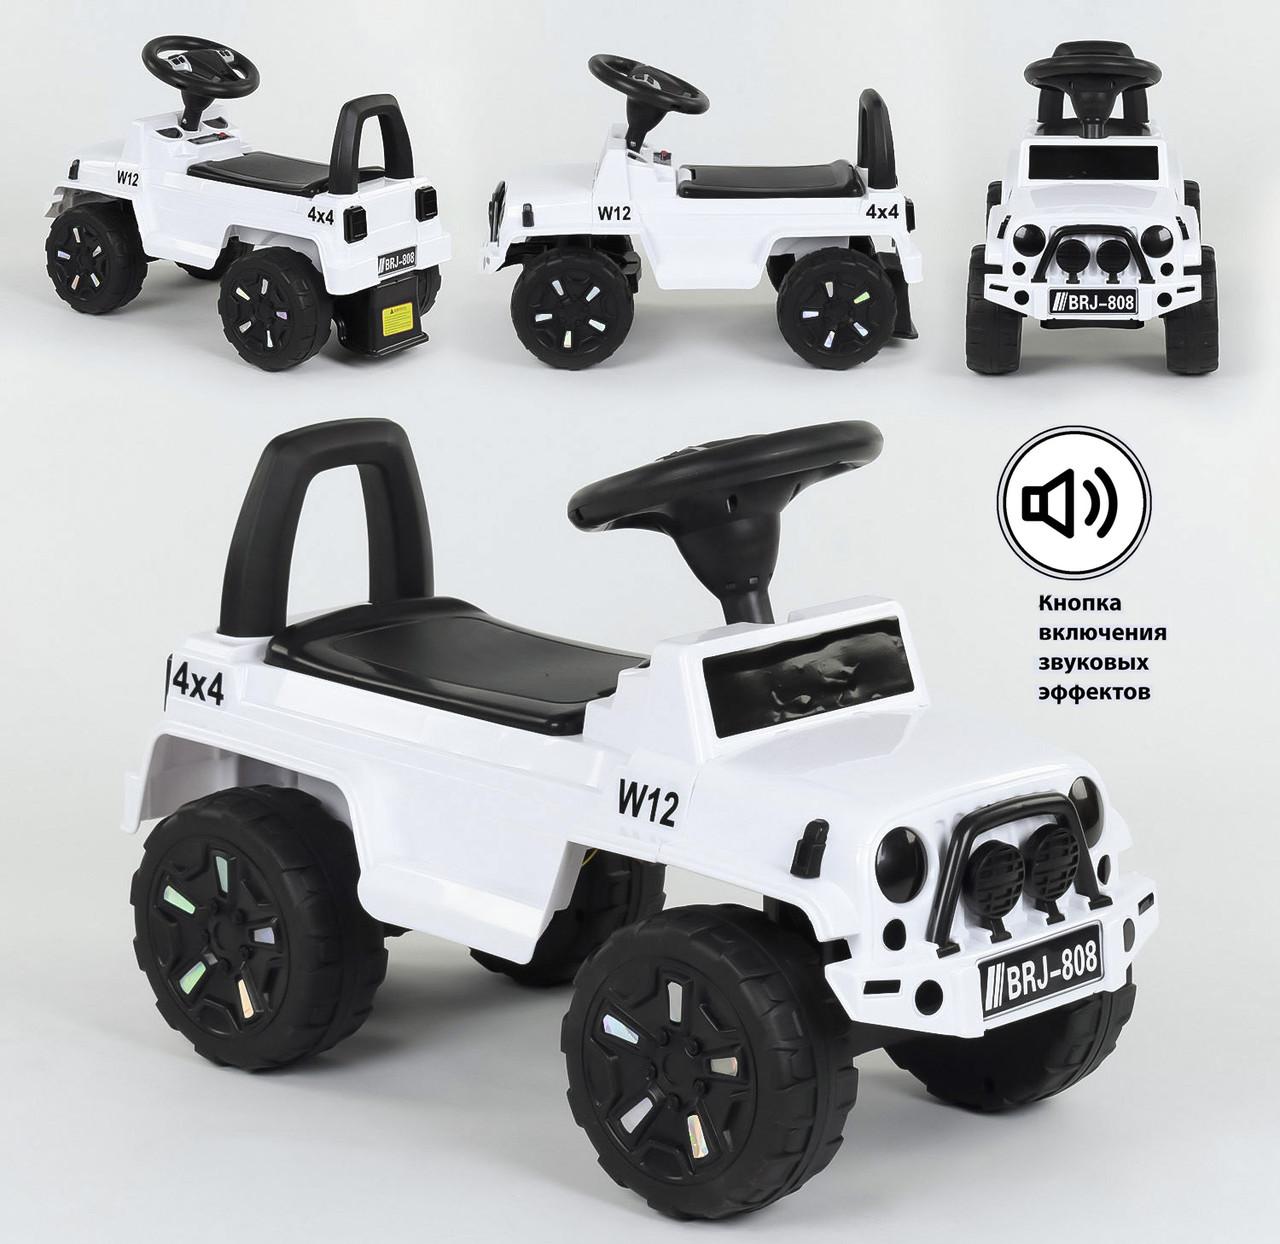 Машина-Толокар 808 G-8005 JOY белая, свет, звук, багажник